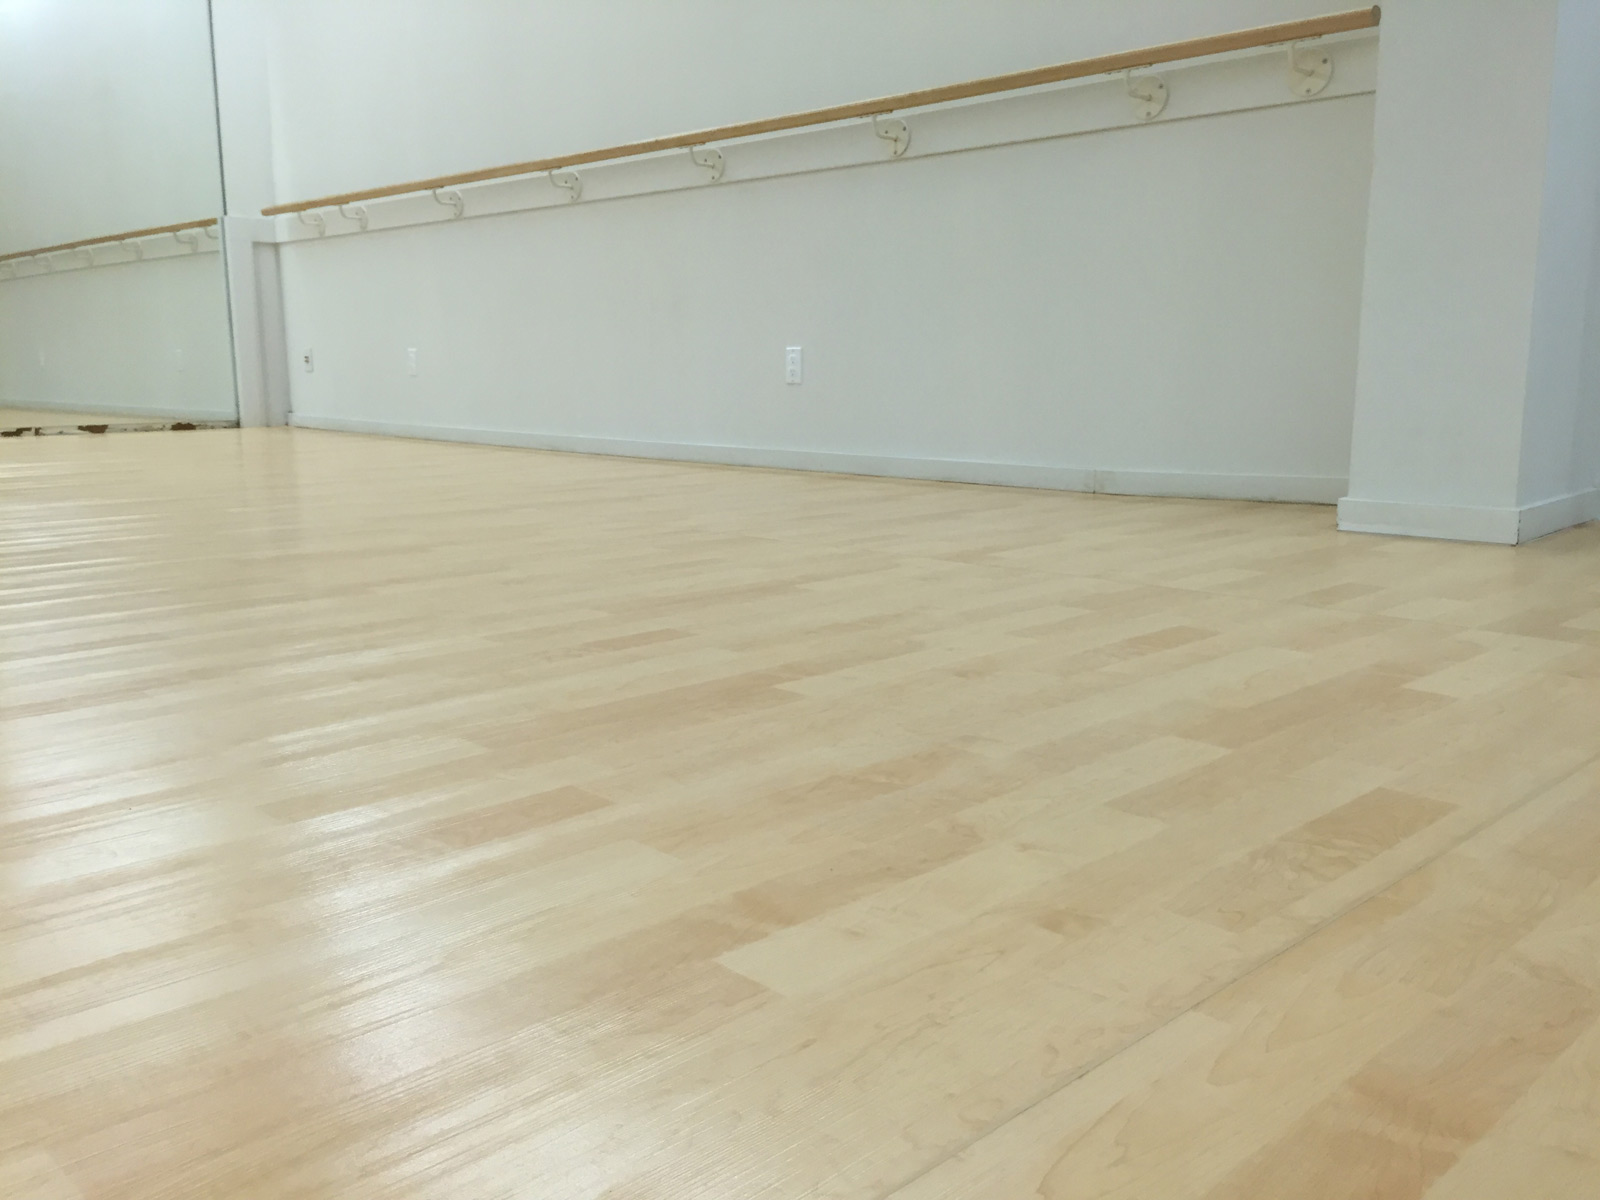 canada glue beaulieu sf in stock sheet loose mess floors sarmazian wood luxury instockluxuryvinyl vinyl alessandria lay price no brothers flooring